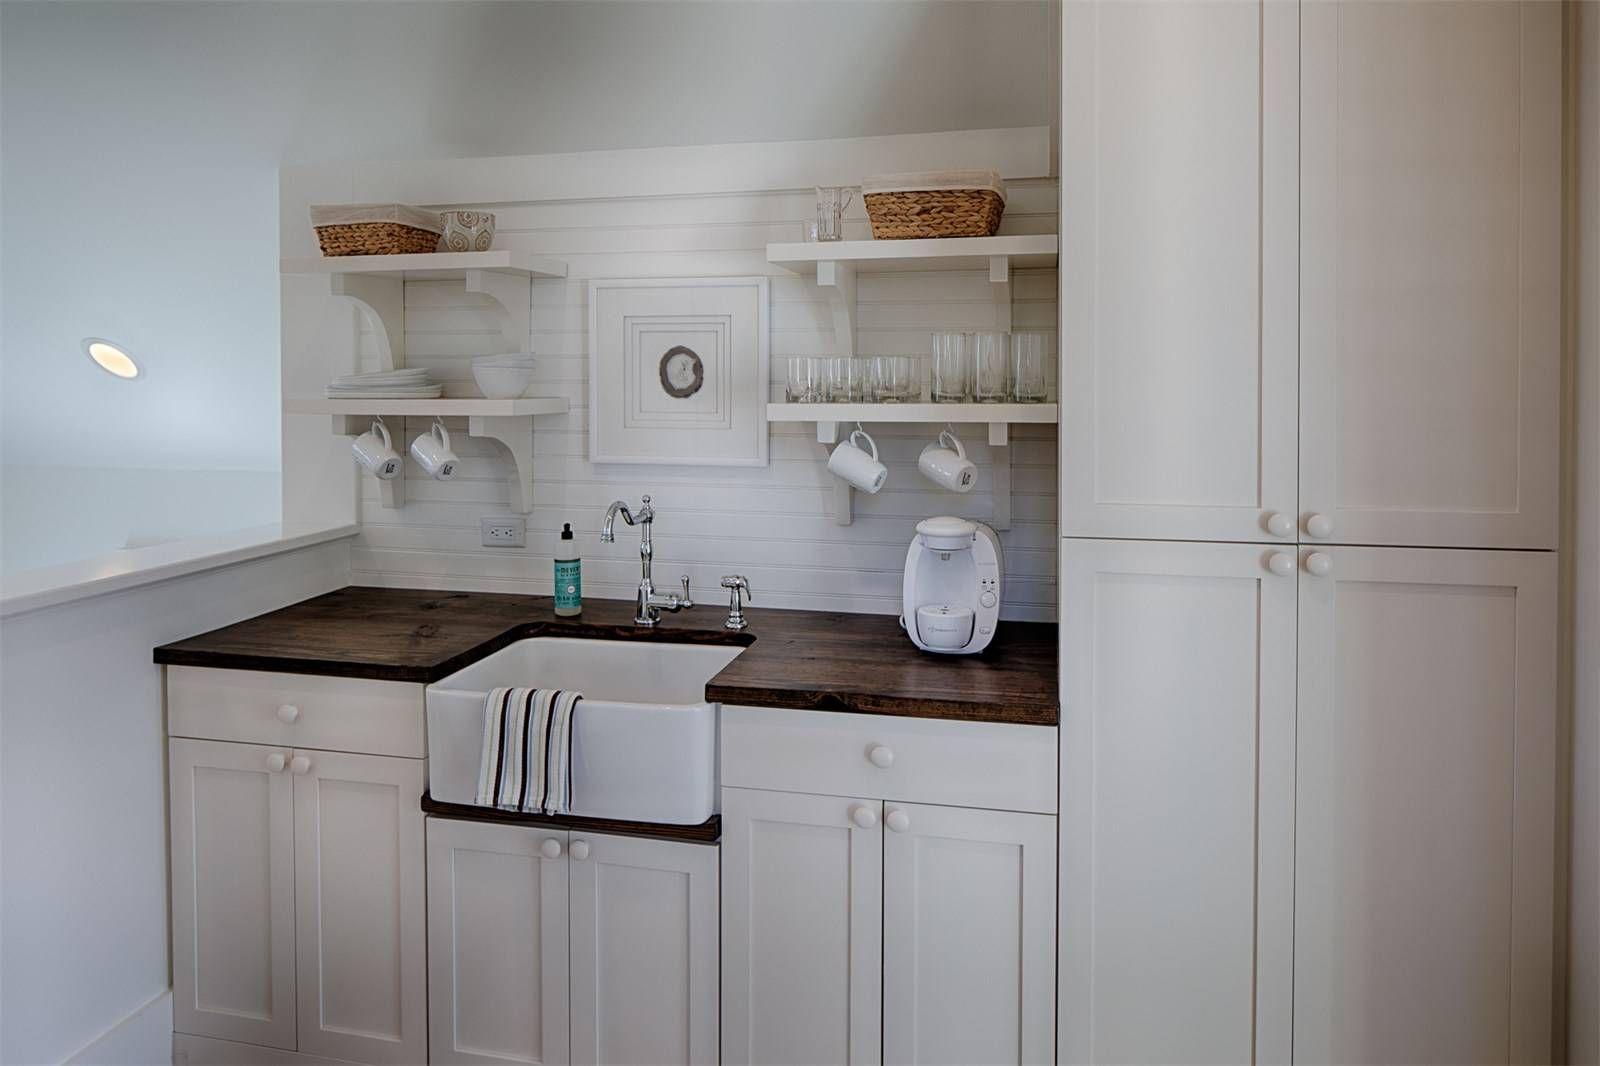 Modern farmhouse style meets coastal cottage decorating ideas